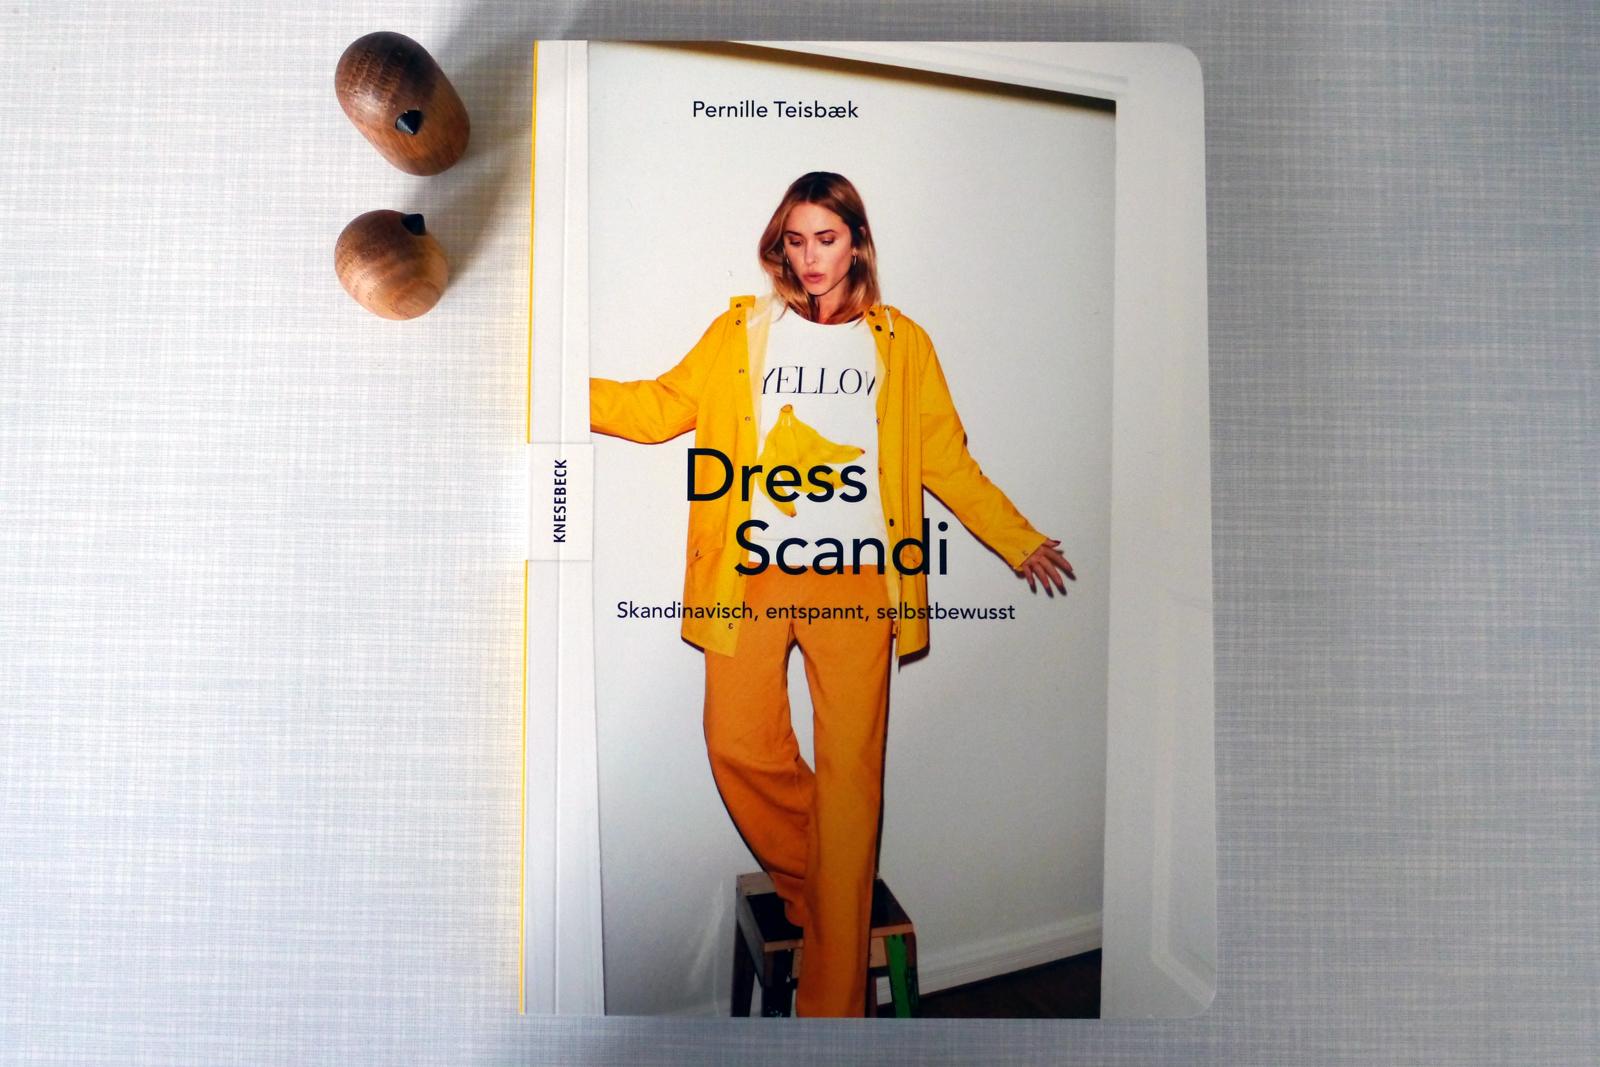 Dress Scandi von Pernille Teisbaek, Knesebeck Verlag